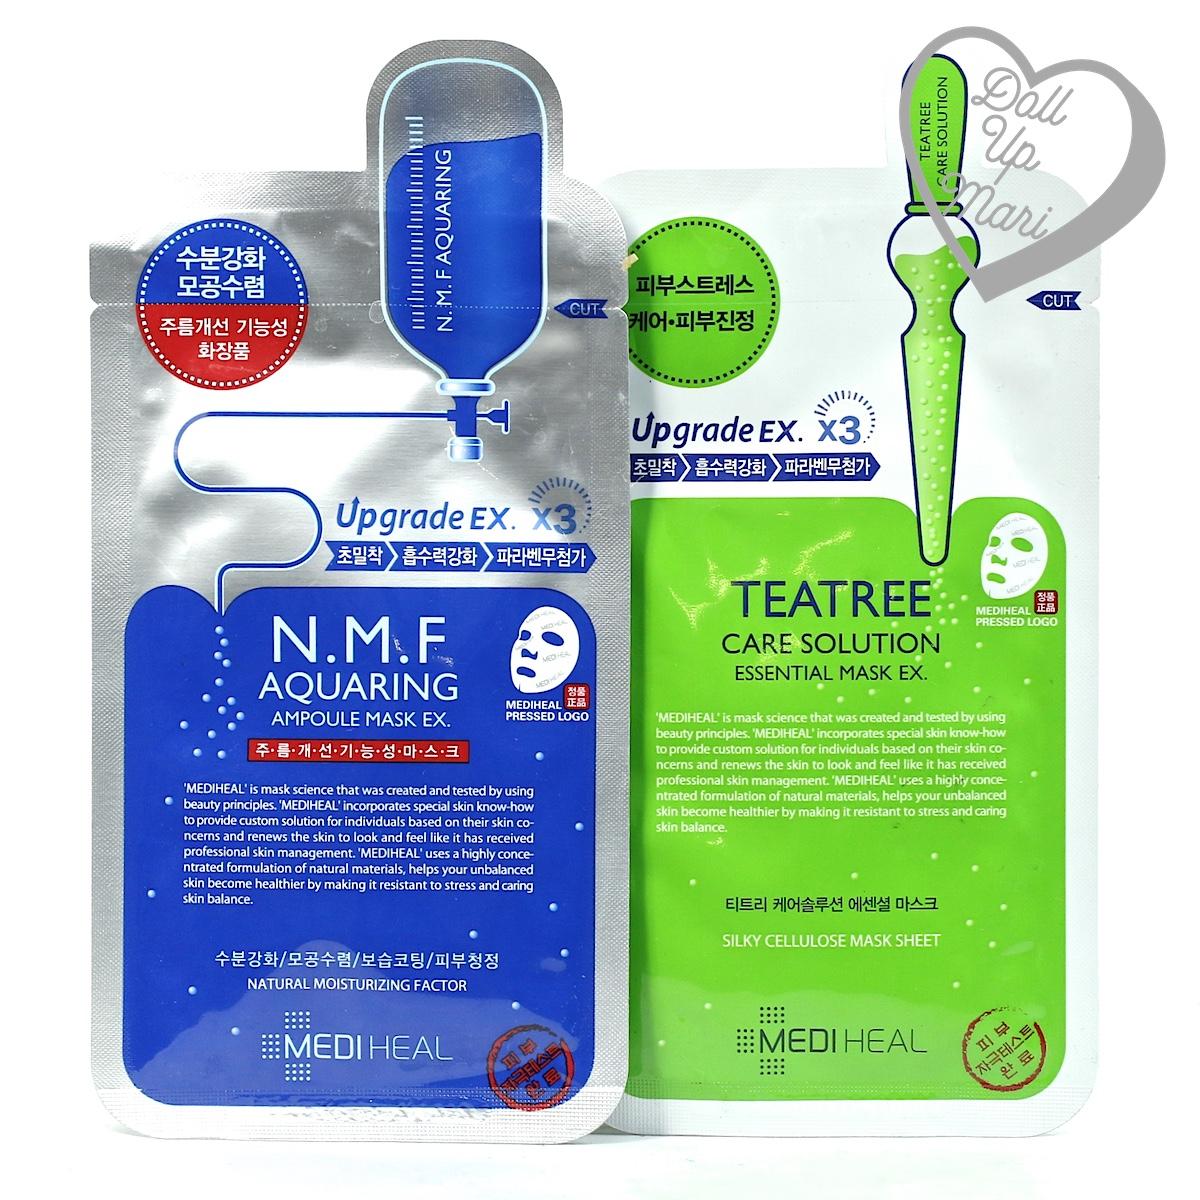 Pack Shot of Mediheal NMF and TeaTree Solution Mask Sheets